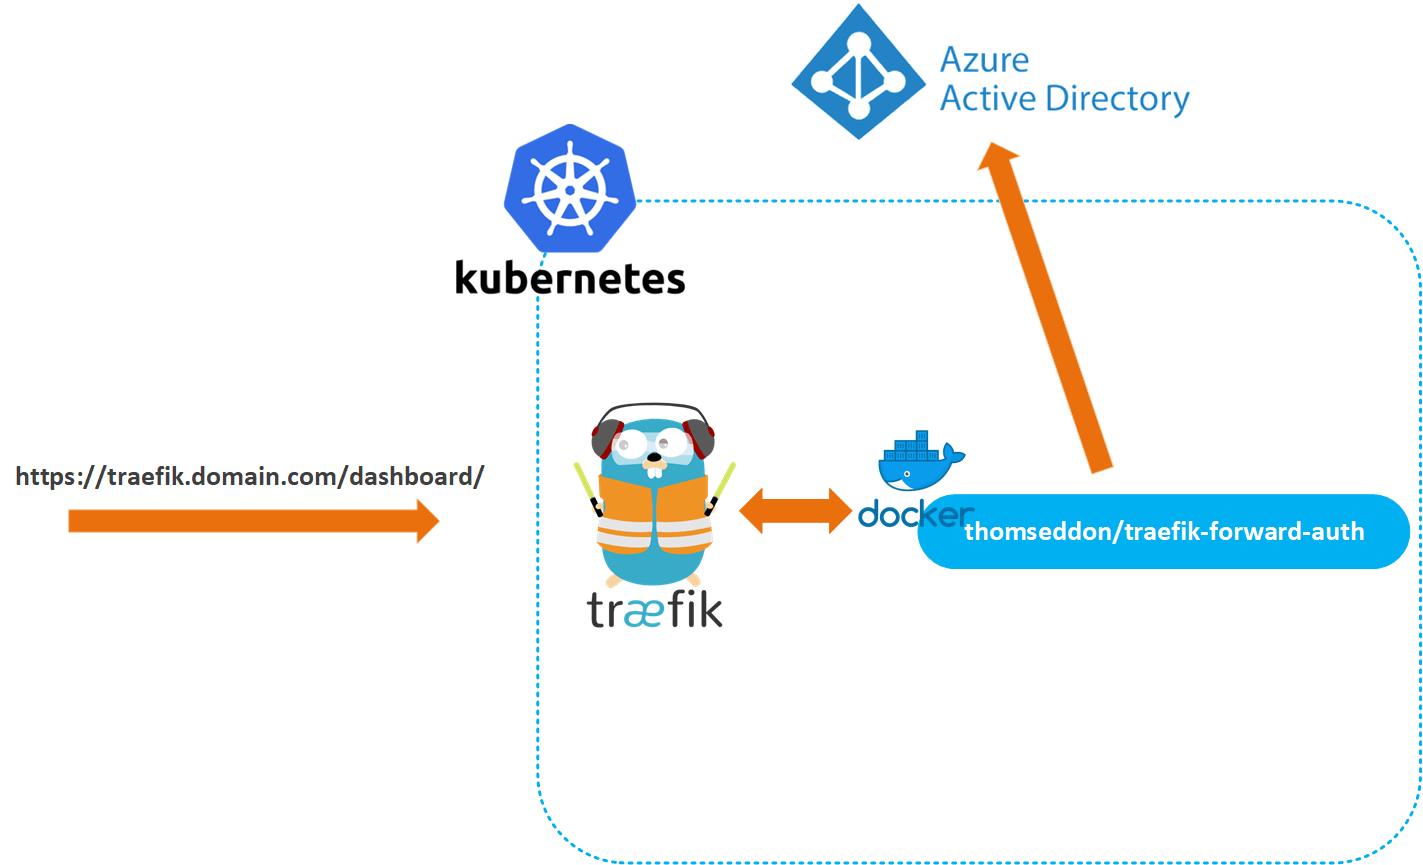 Securing Traefik Dashboard with Azure AD